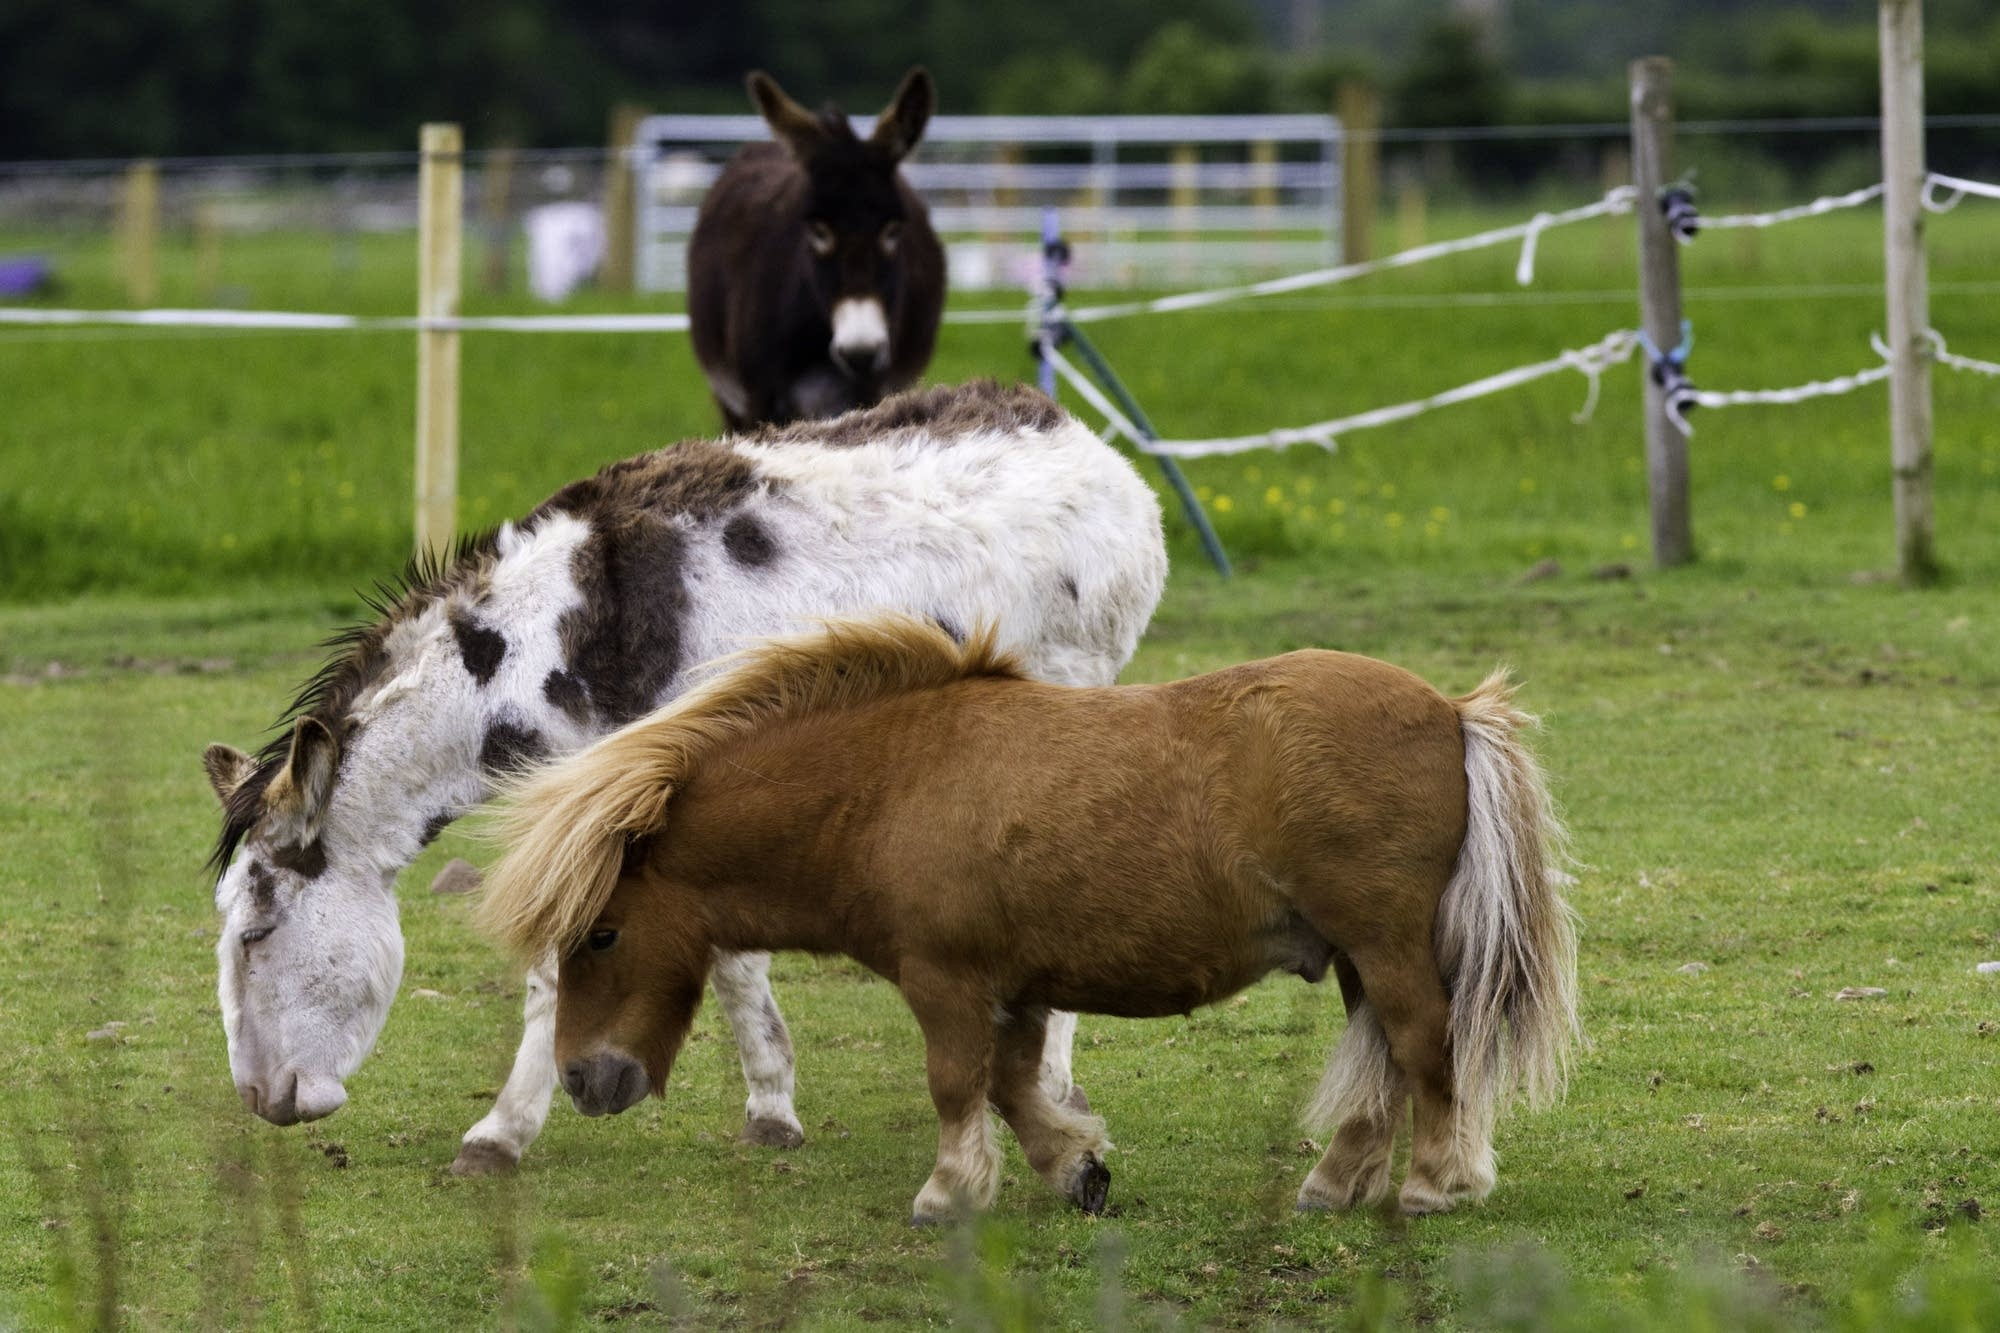 Edinburgh - 33 - Ponies